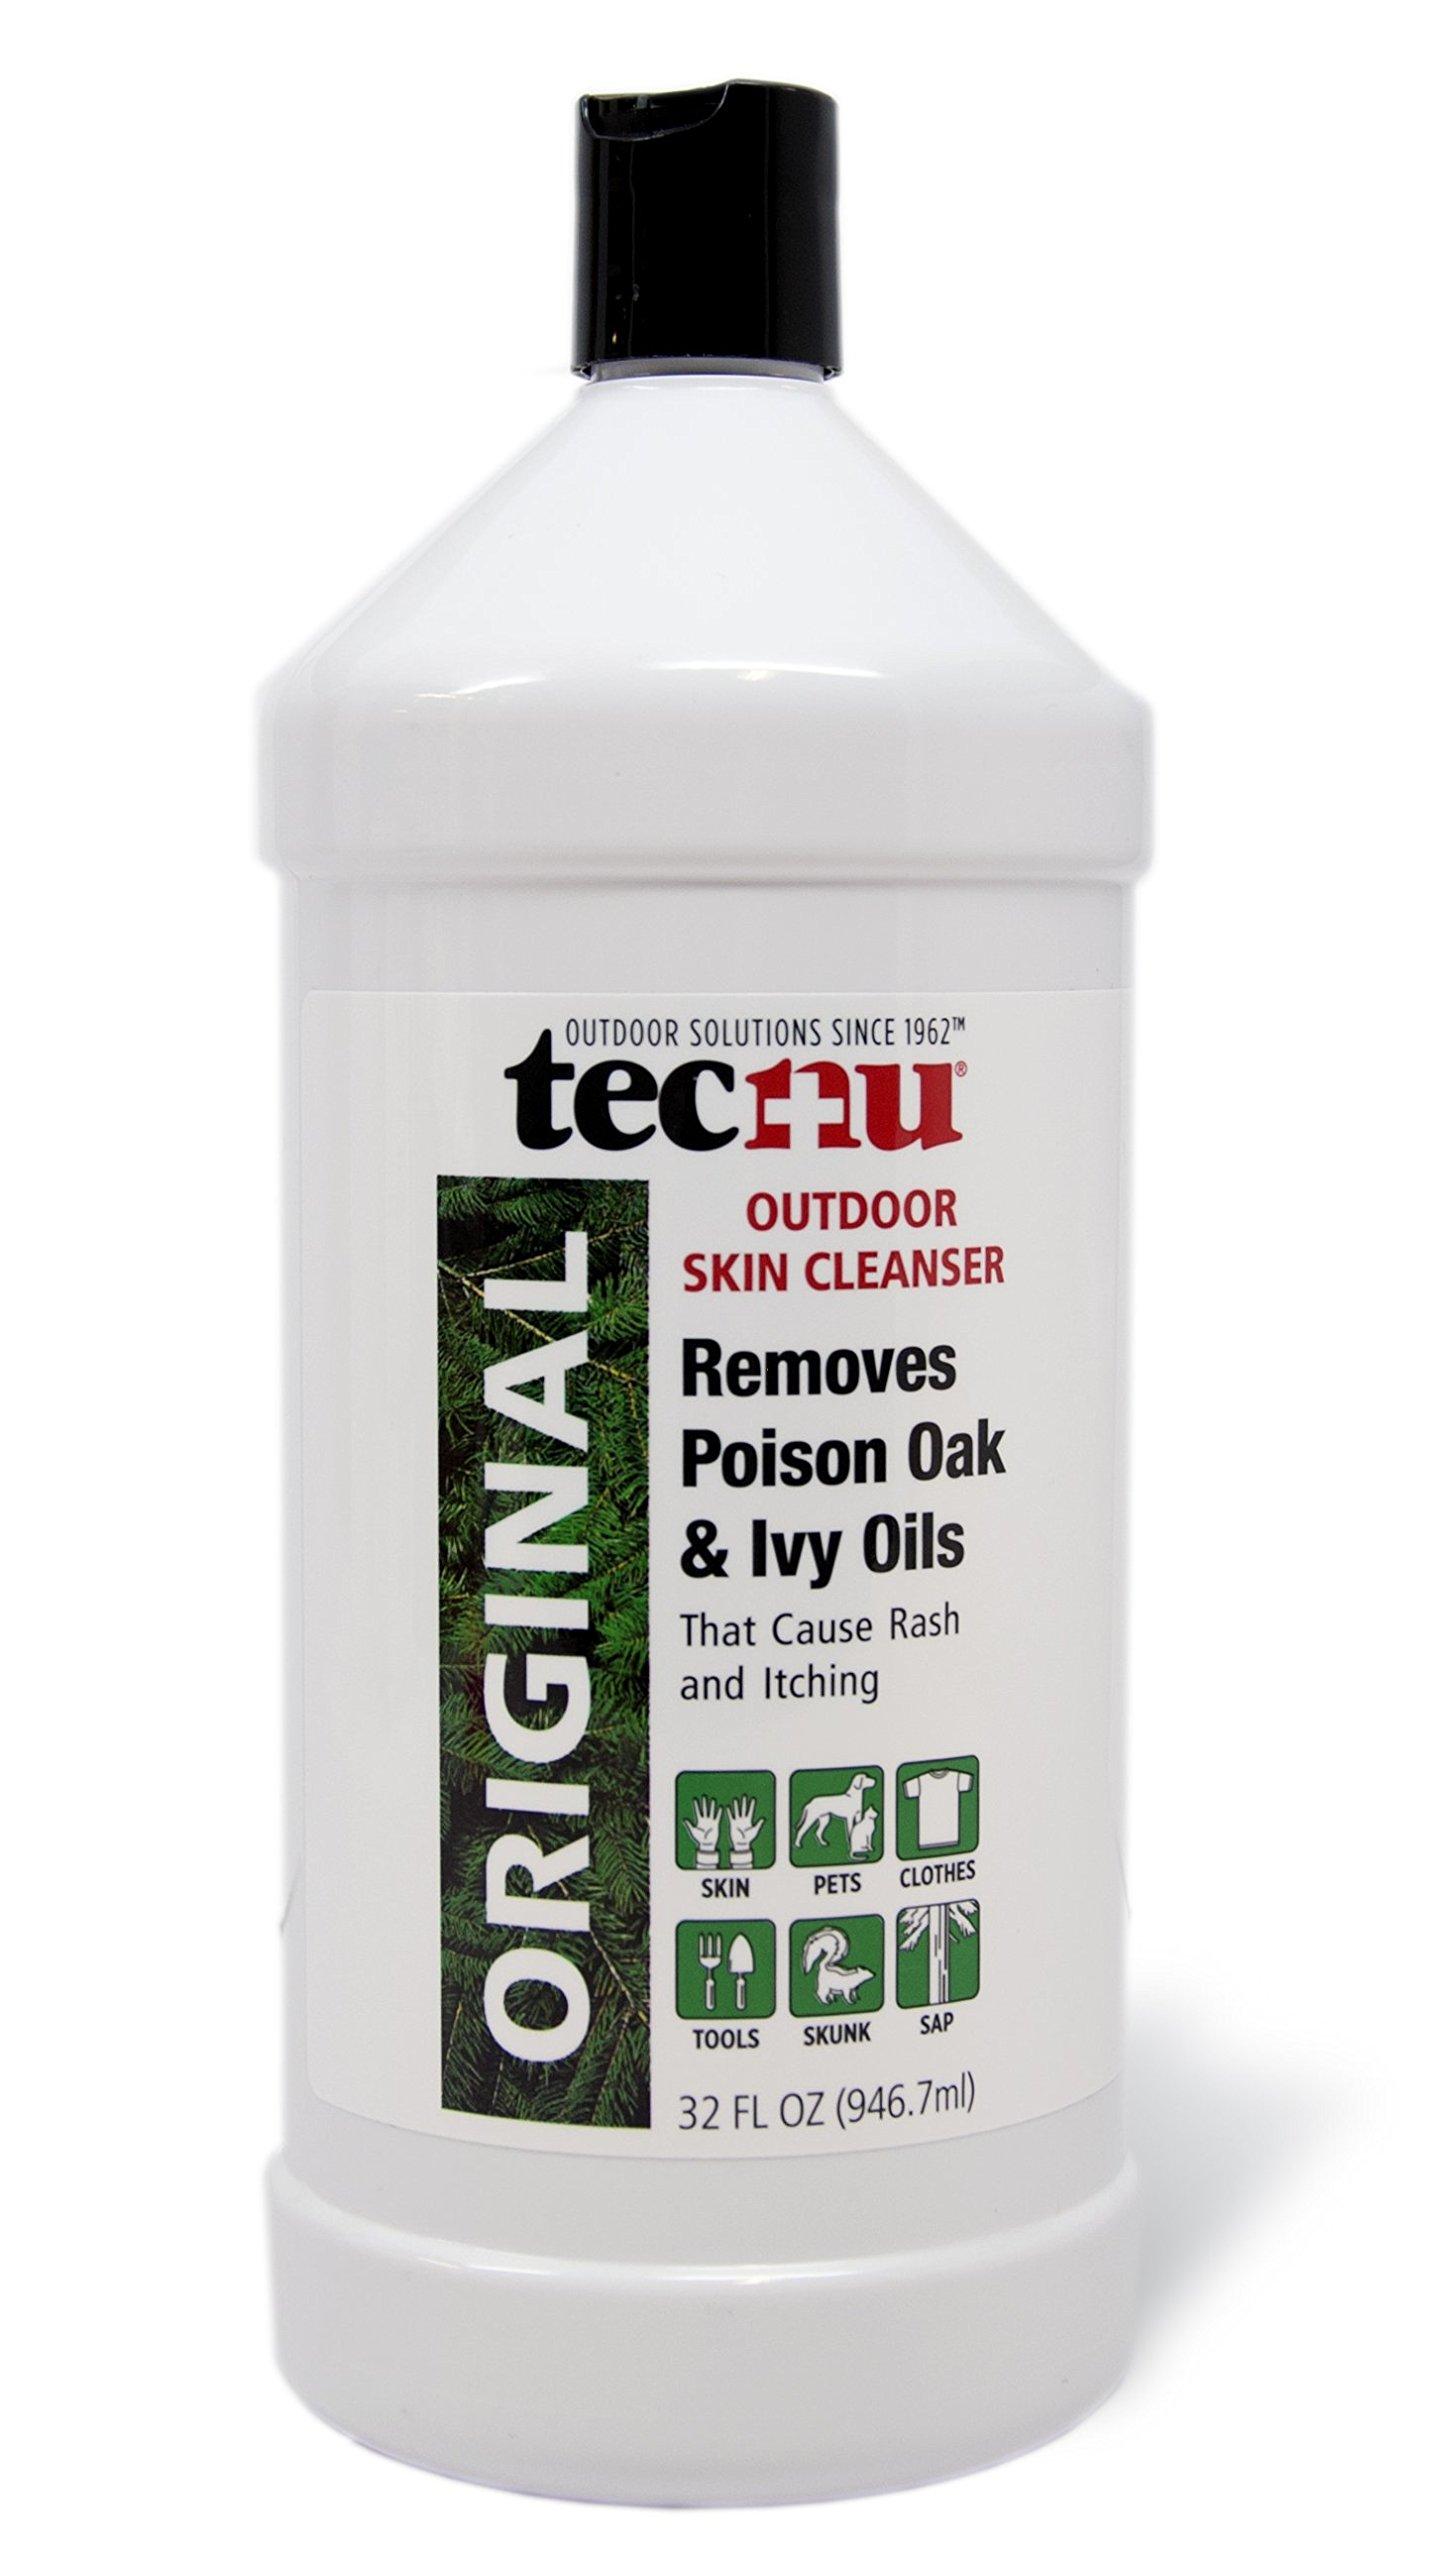 Tecnu Original Poison Oak & Ivy Outdoor Skin Cleanser, 32 Ounce